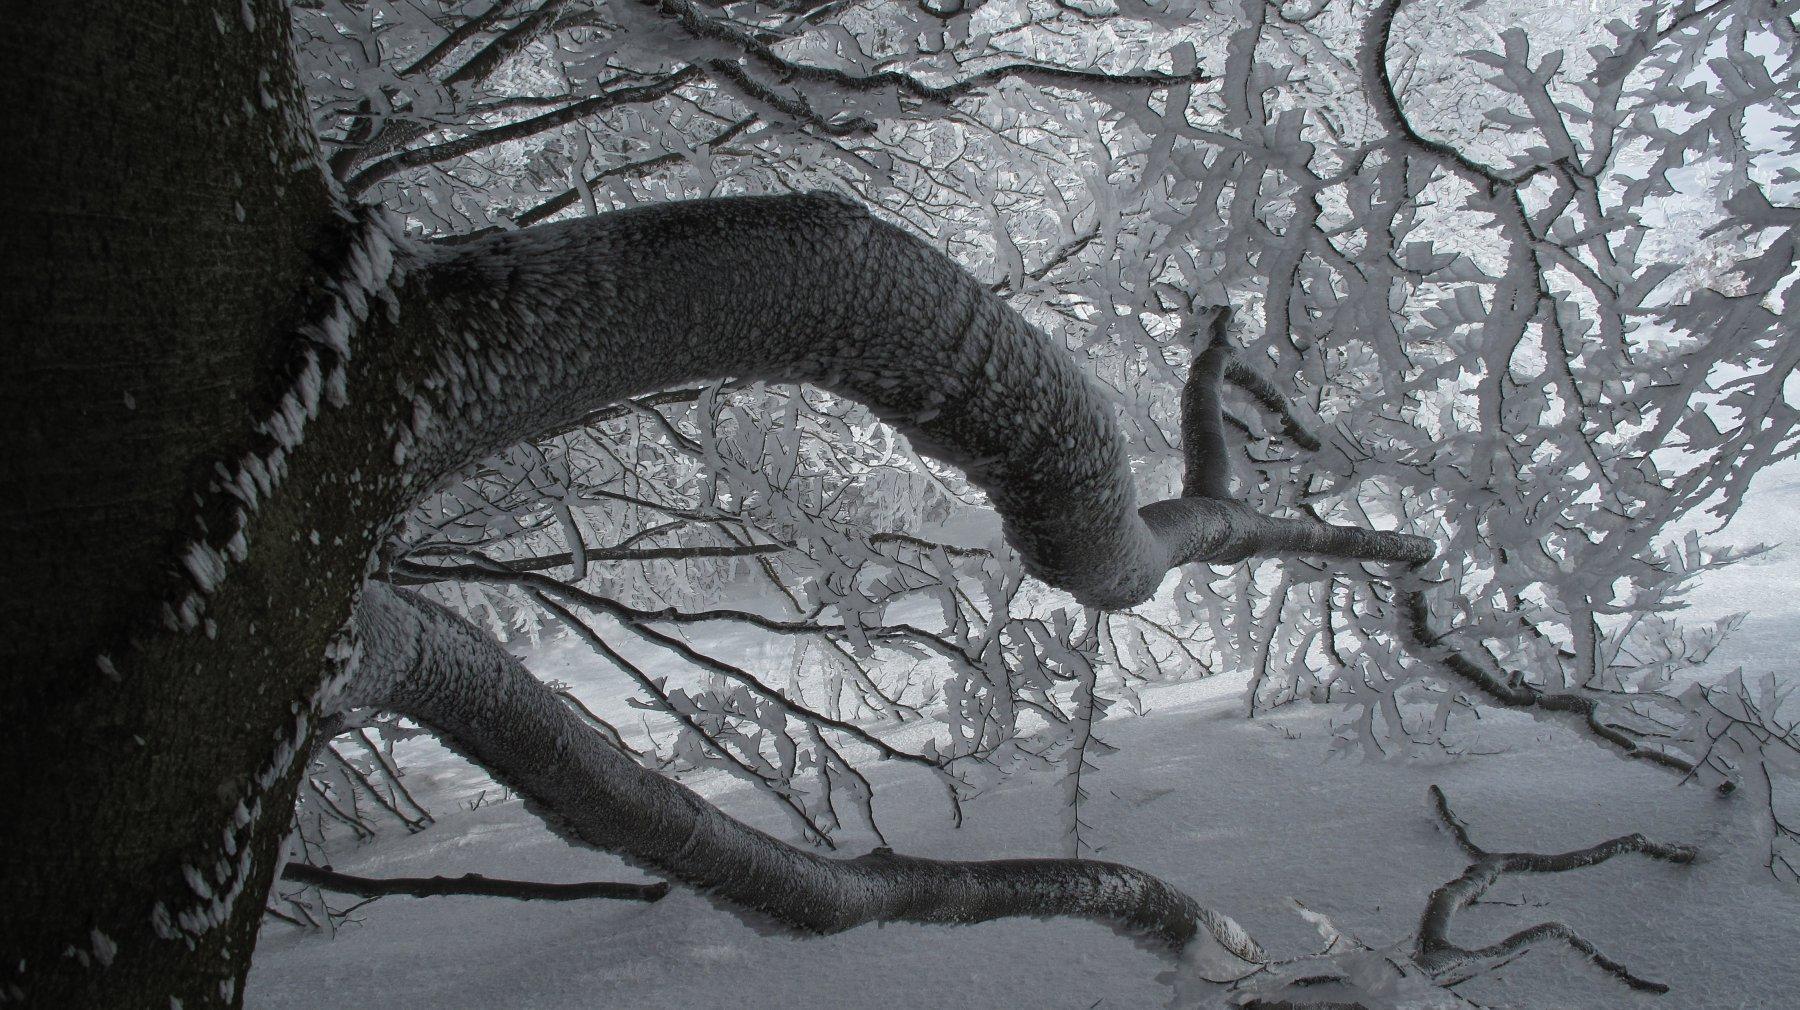 Tronco nel bosco